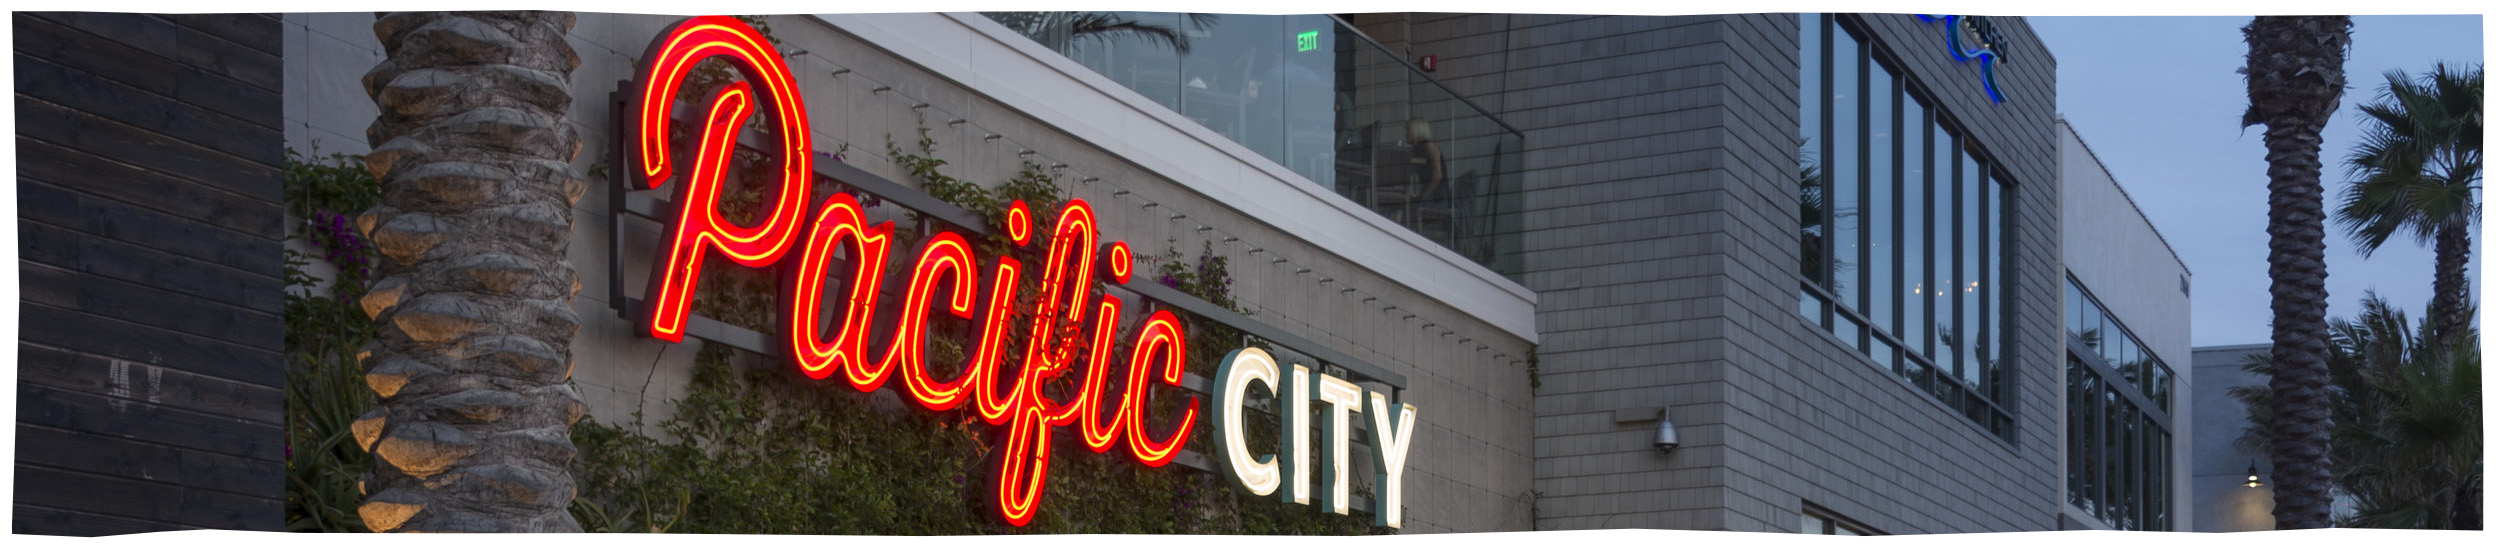 pacific city2.jpg